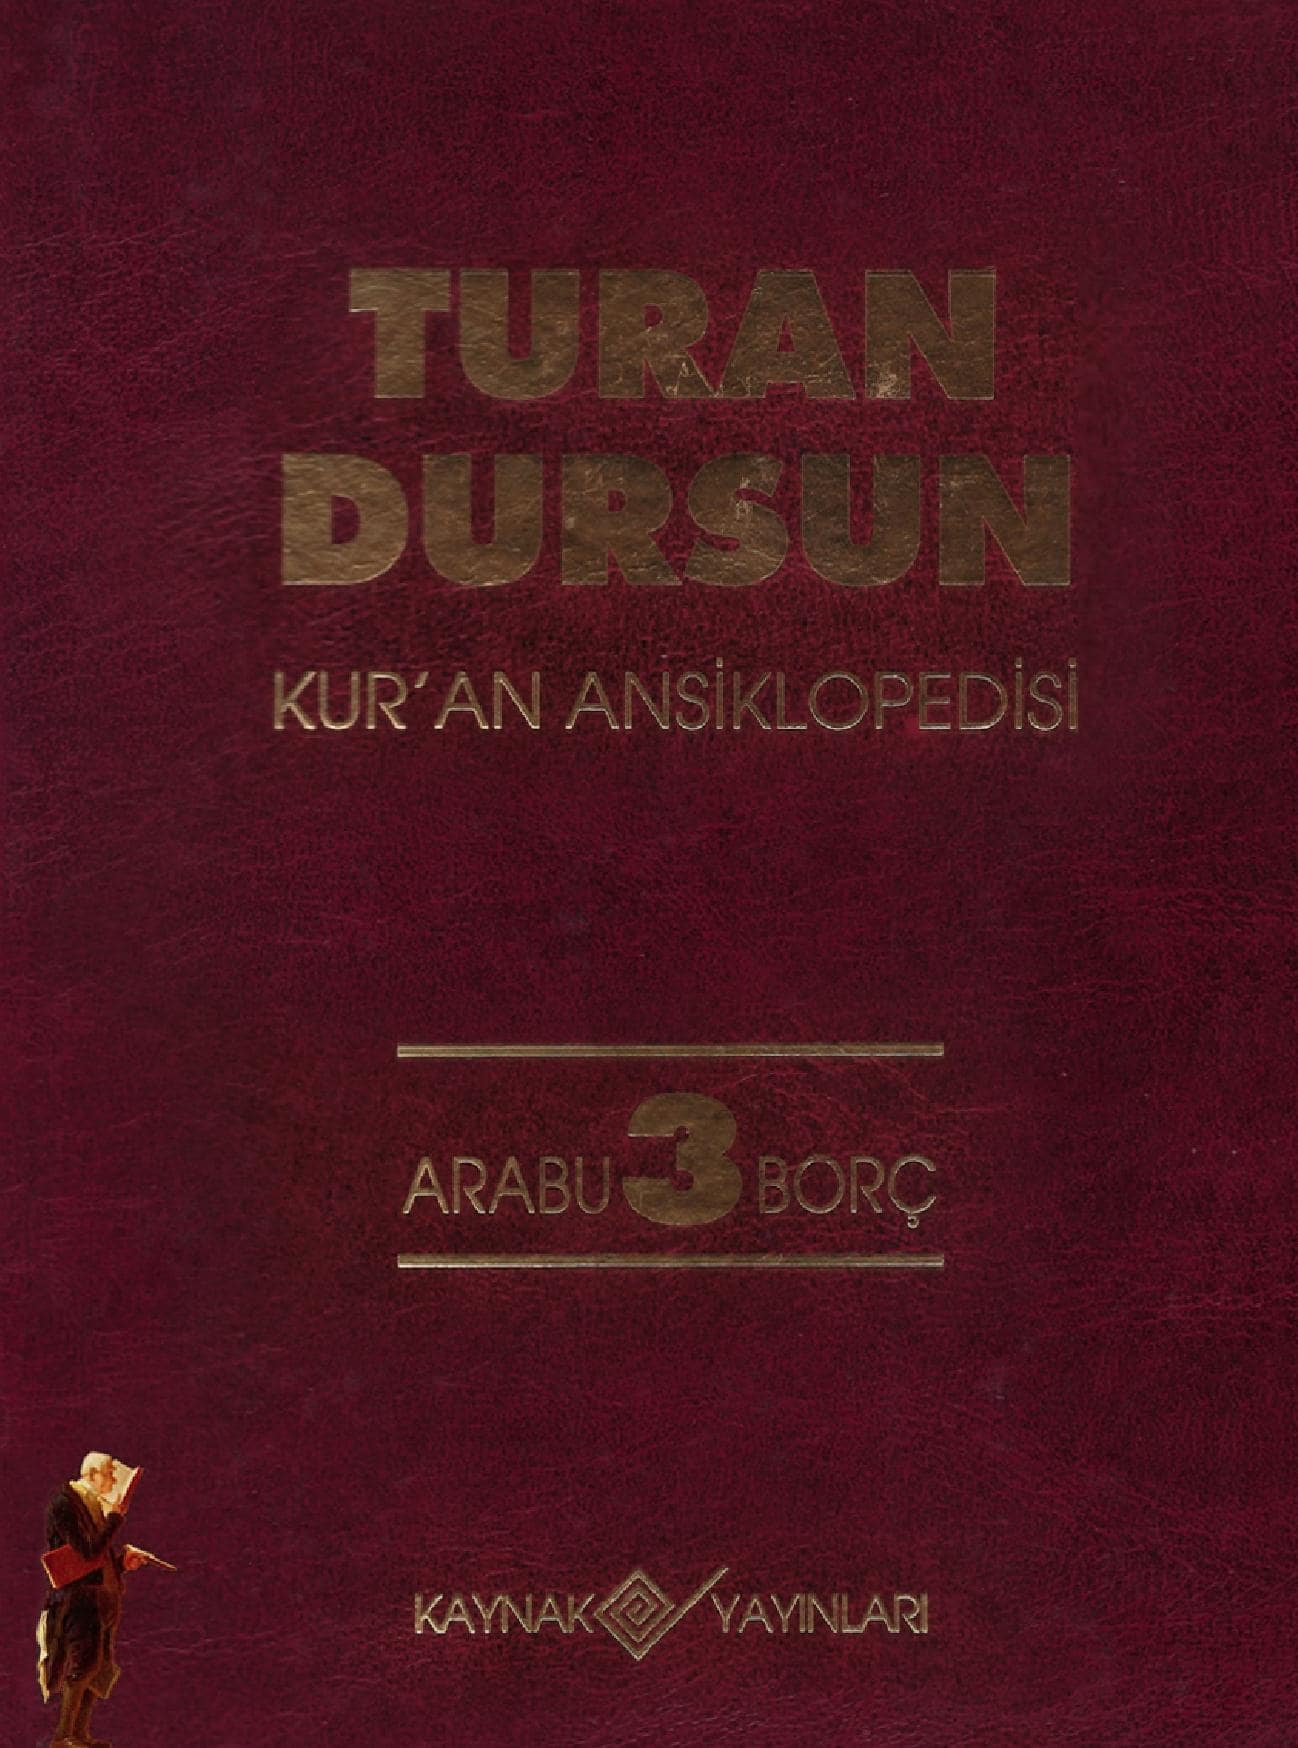 Turan Dursun. Kur'an Ansiklopedisi. 3. Cilt: Arabu-Borç (1994)